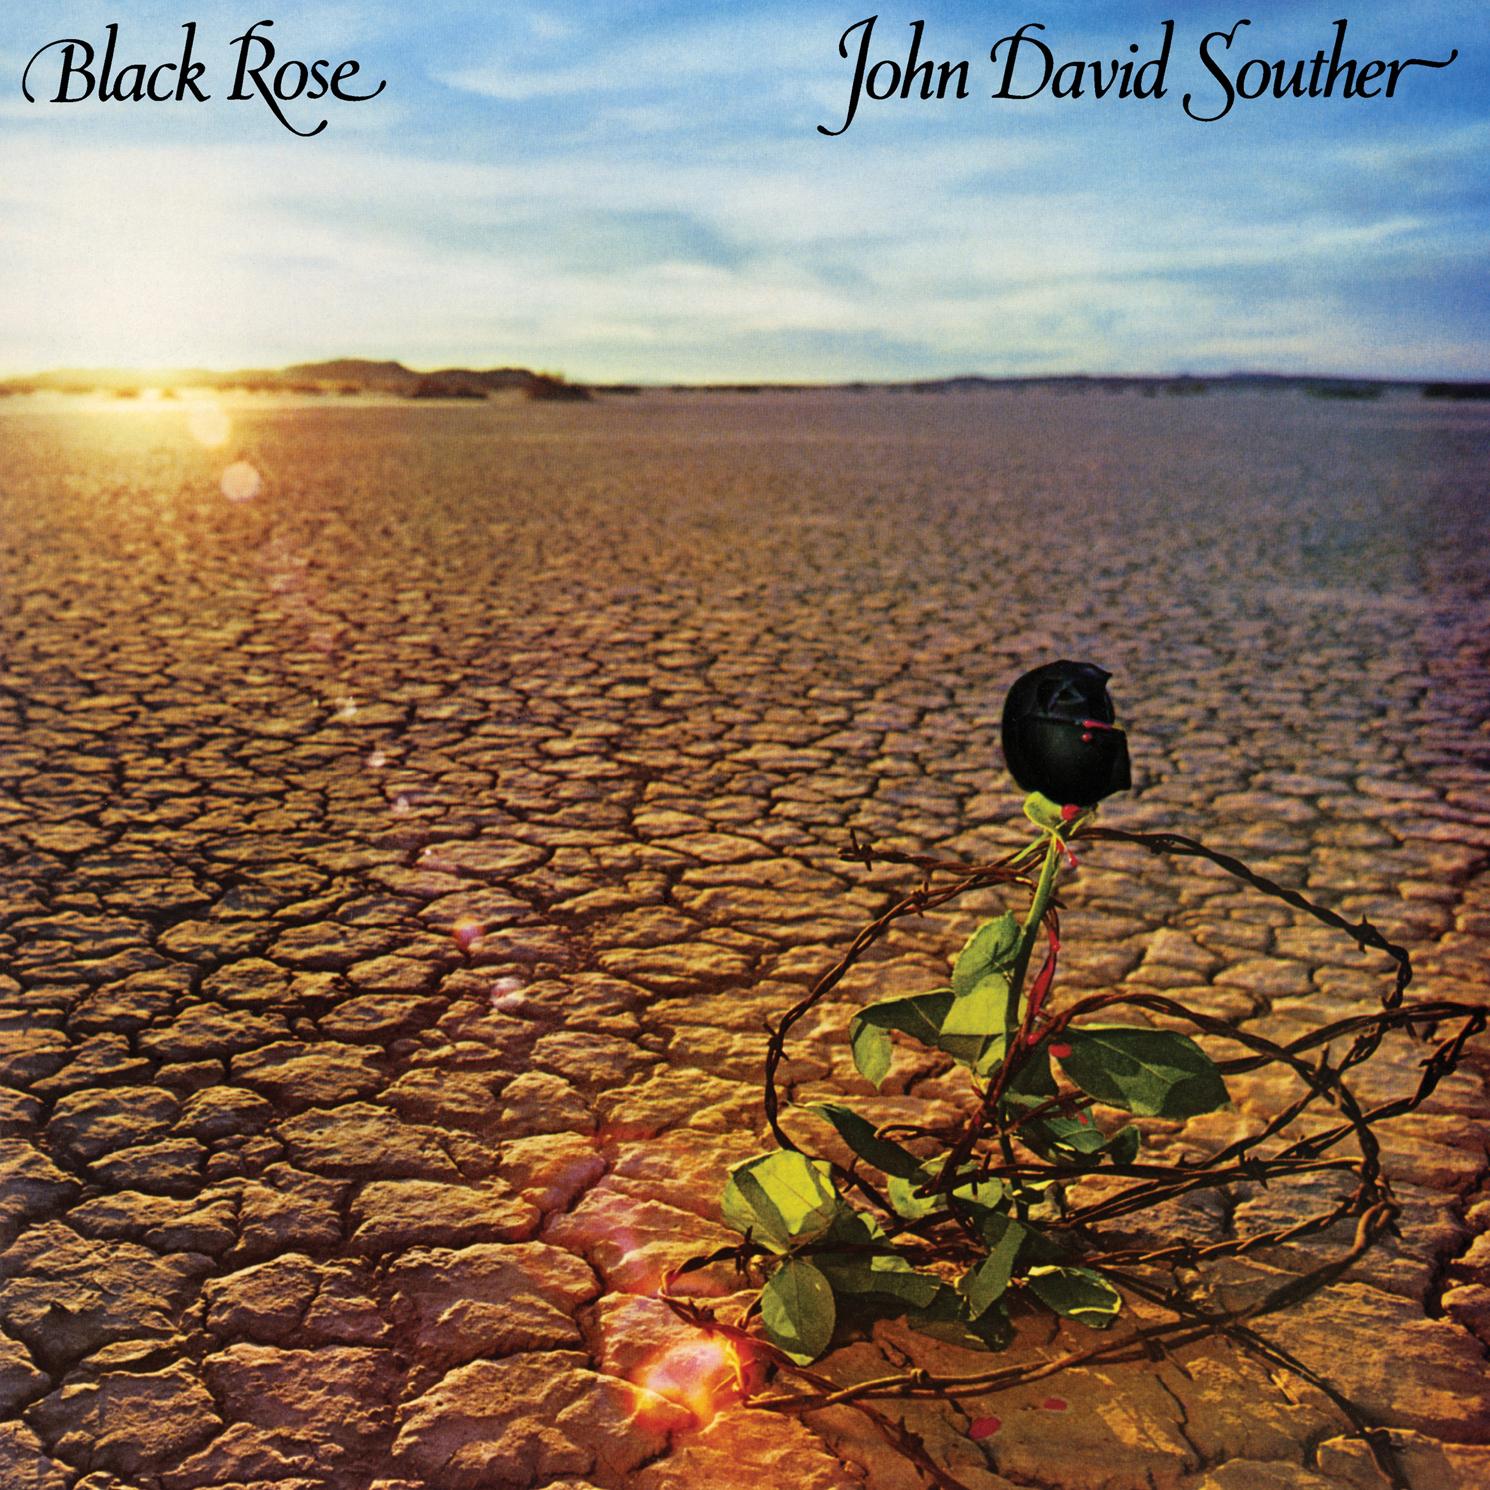 JD Souther - Black Rose  Release Date: February 12, 2016 Label: Omnivore Recordings  SERVICE: Mastering NUMBER OF DISCS: 1 GENRE: Rock FORMAT: CD   TRAILER